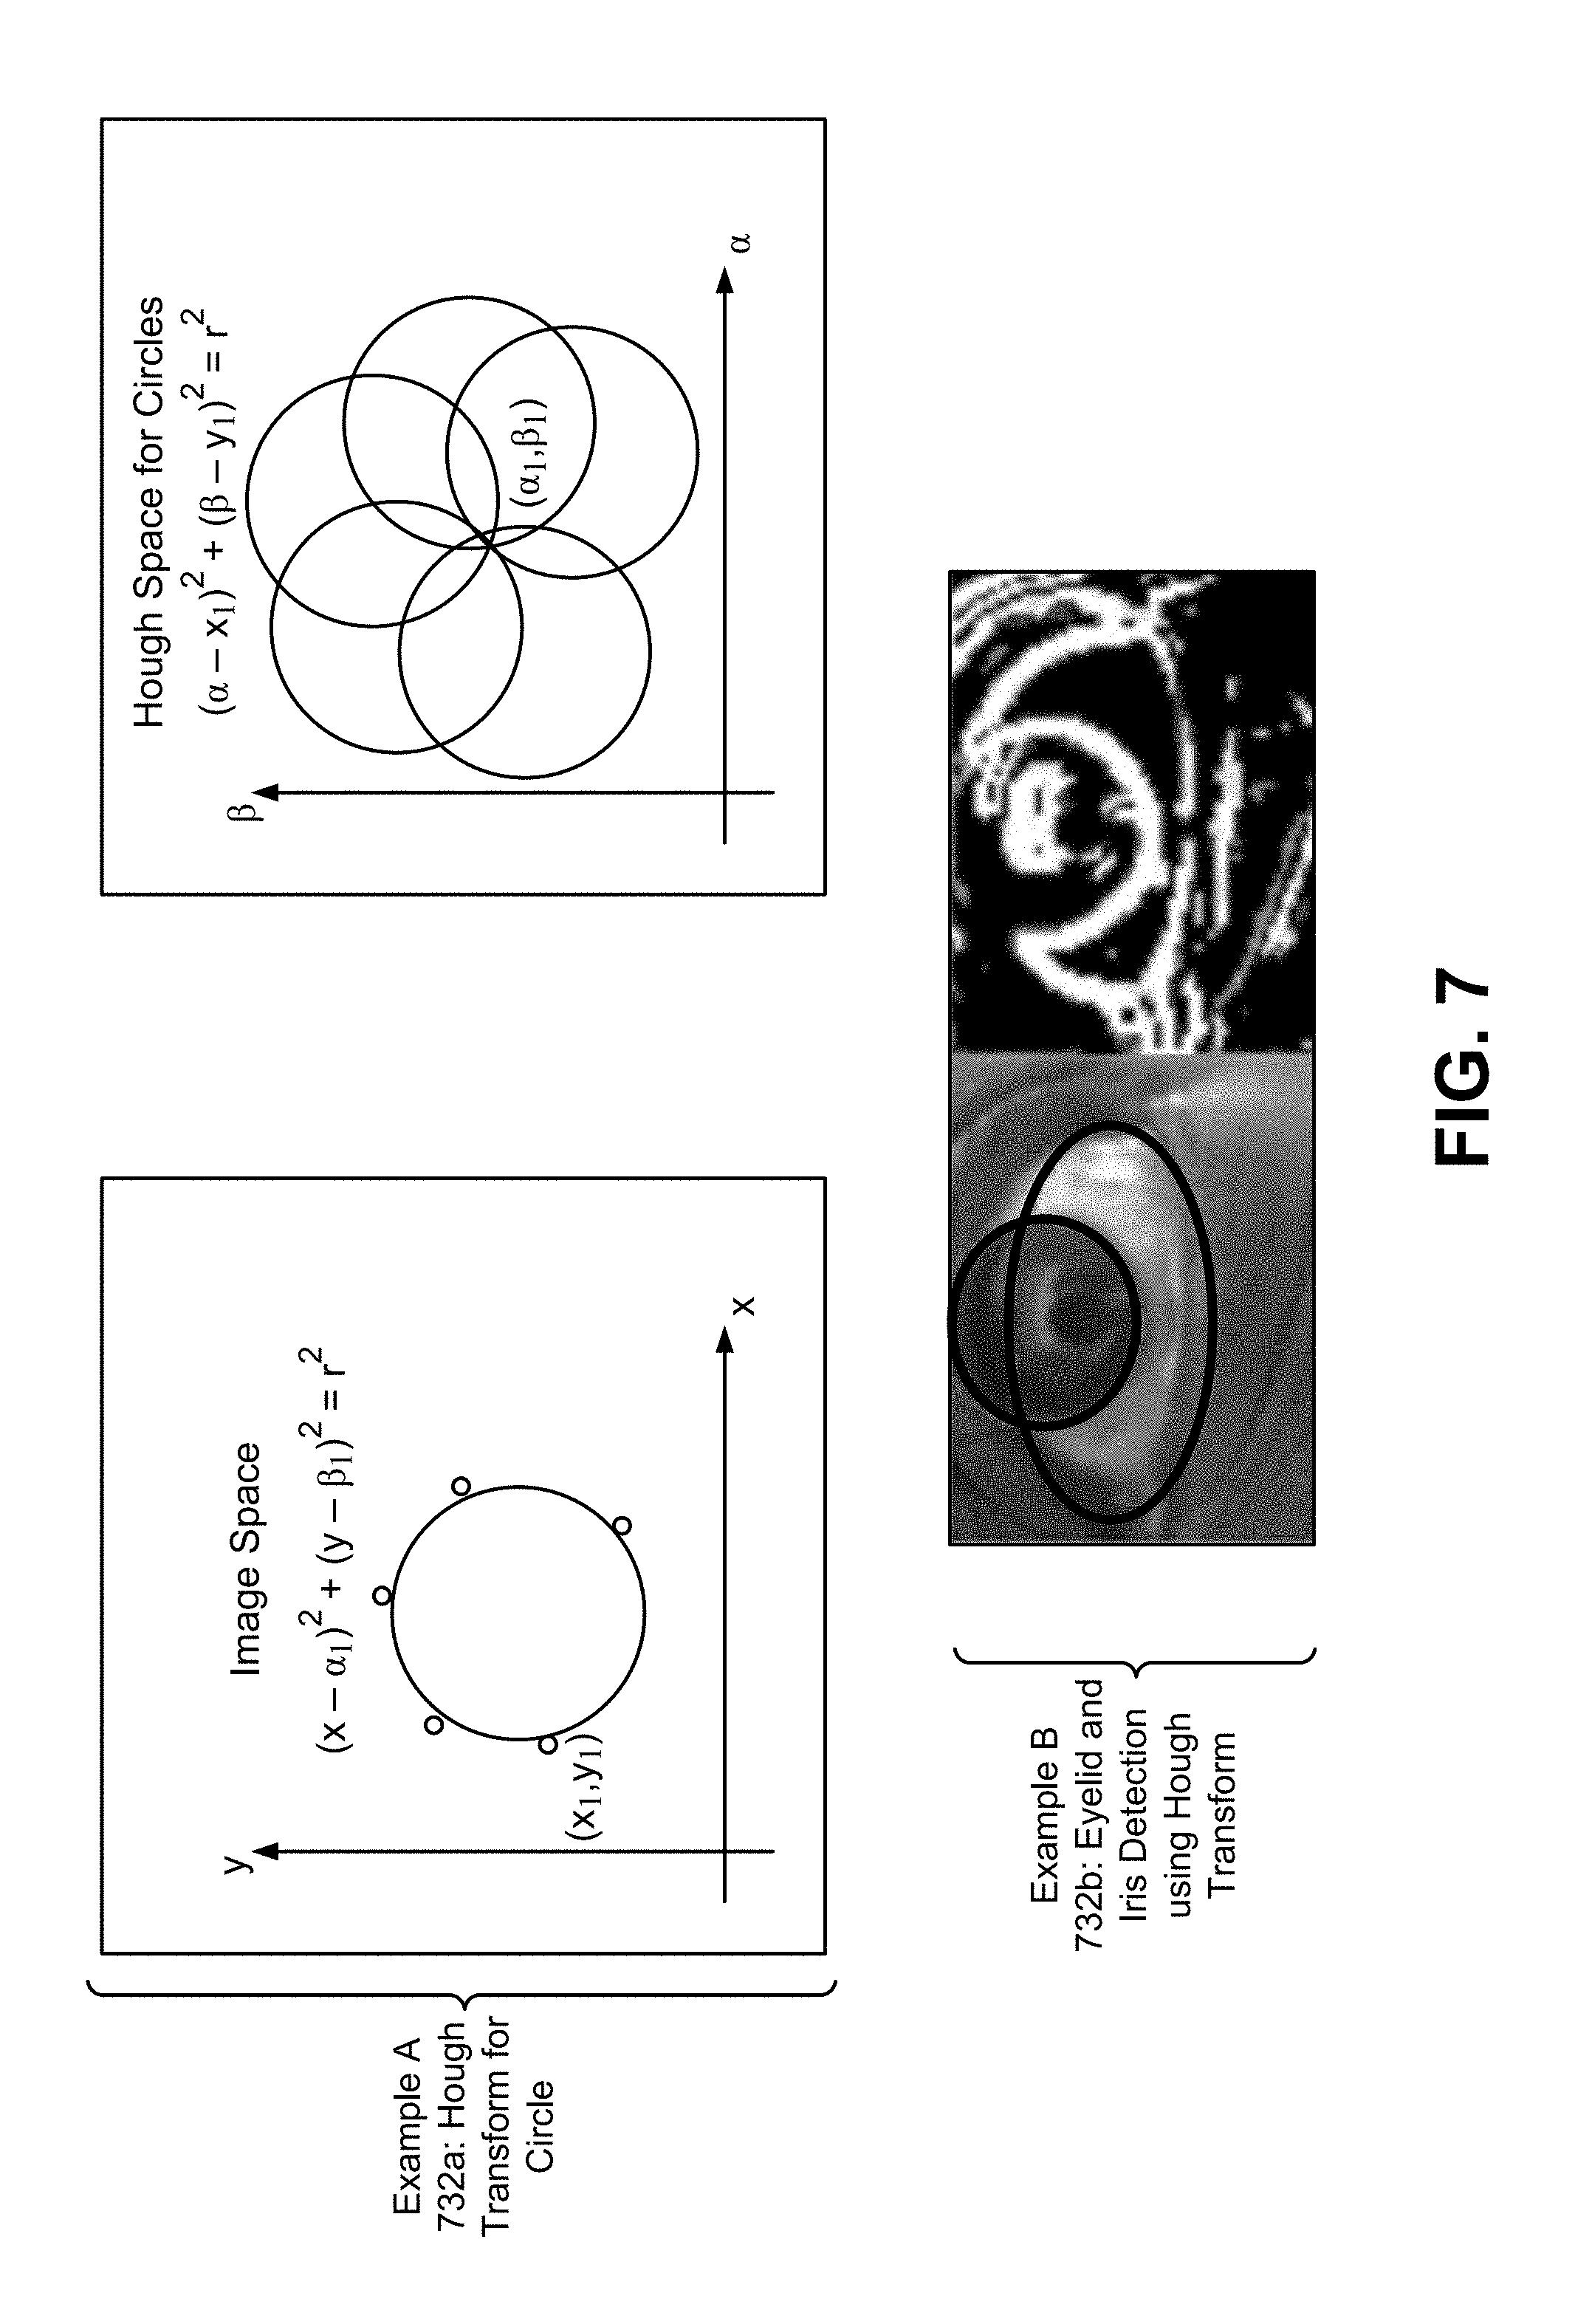 Patent US 10,147,017 B2